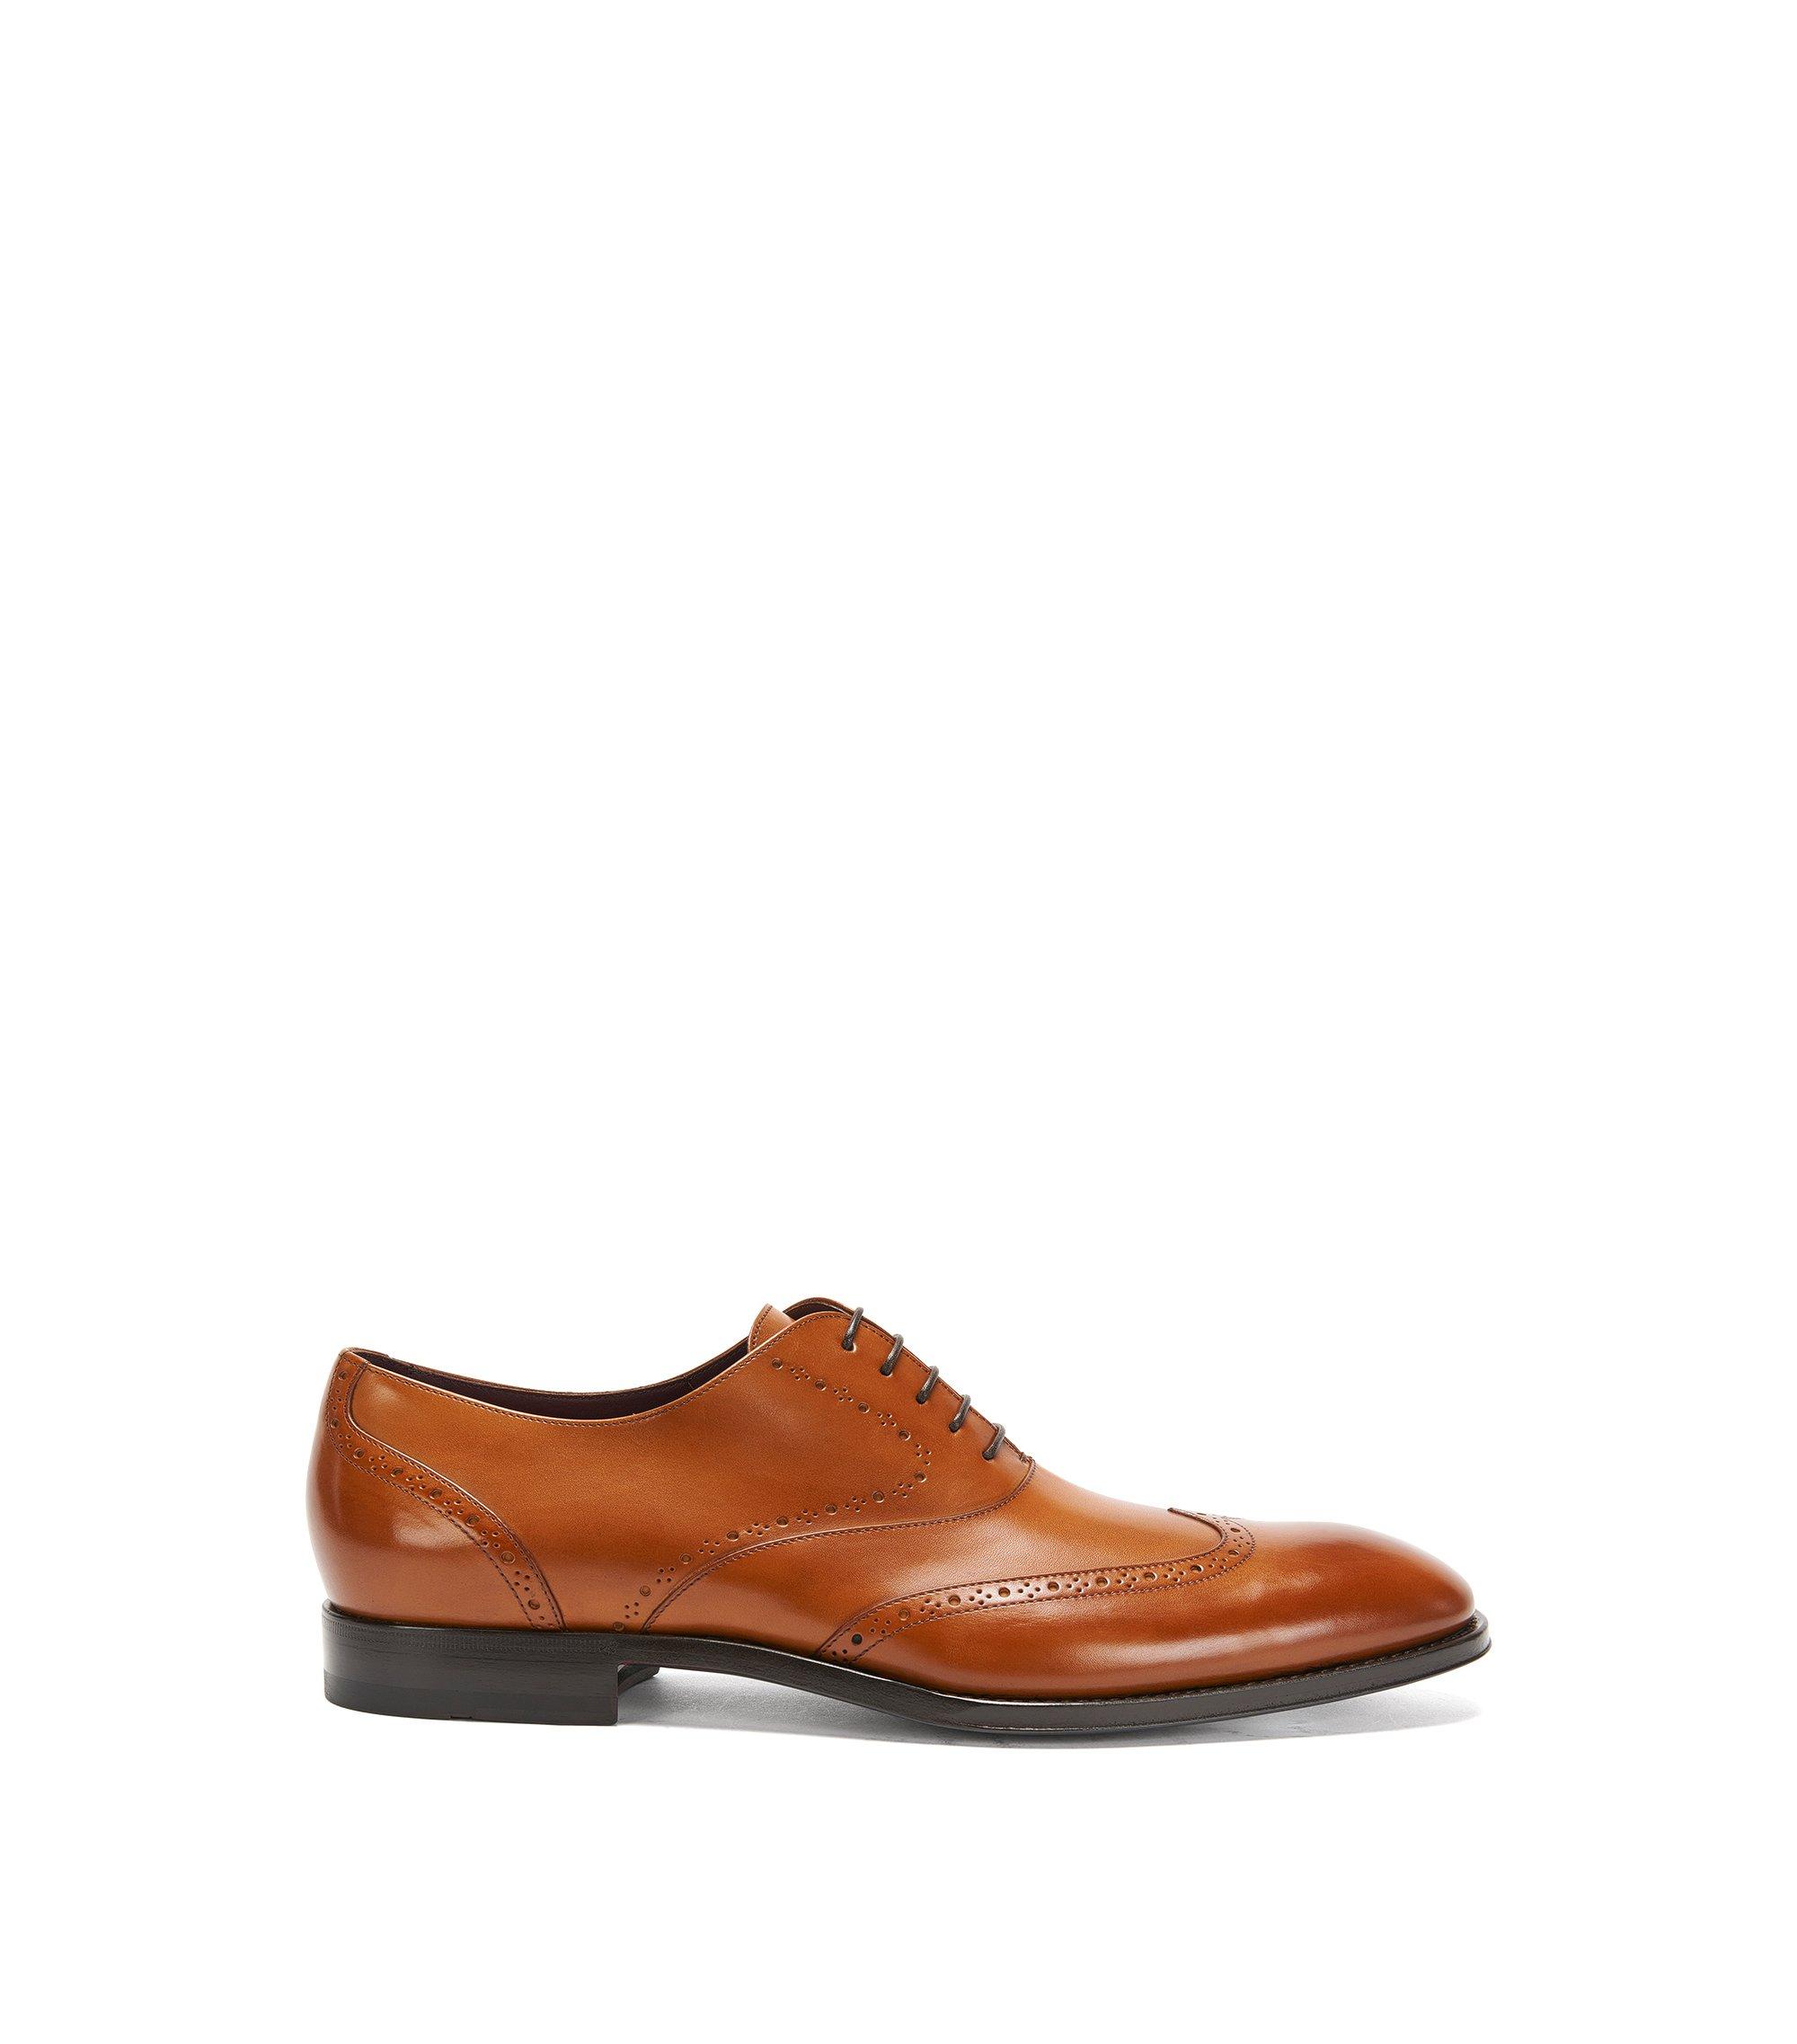 Italian Calfskin Oxford Wingtip Dress Shoe   T-Legend Oxfr Wt, Brown